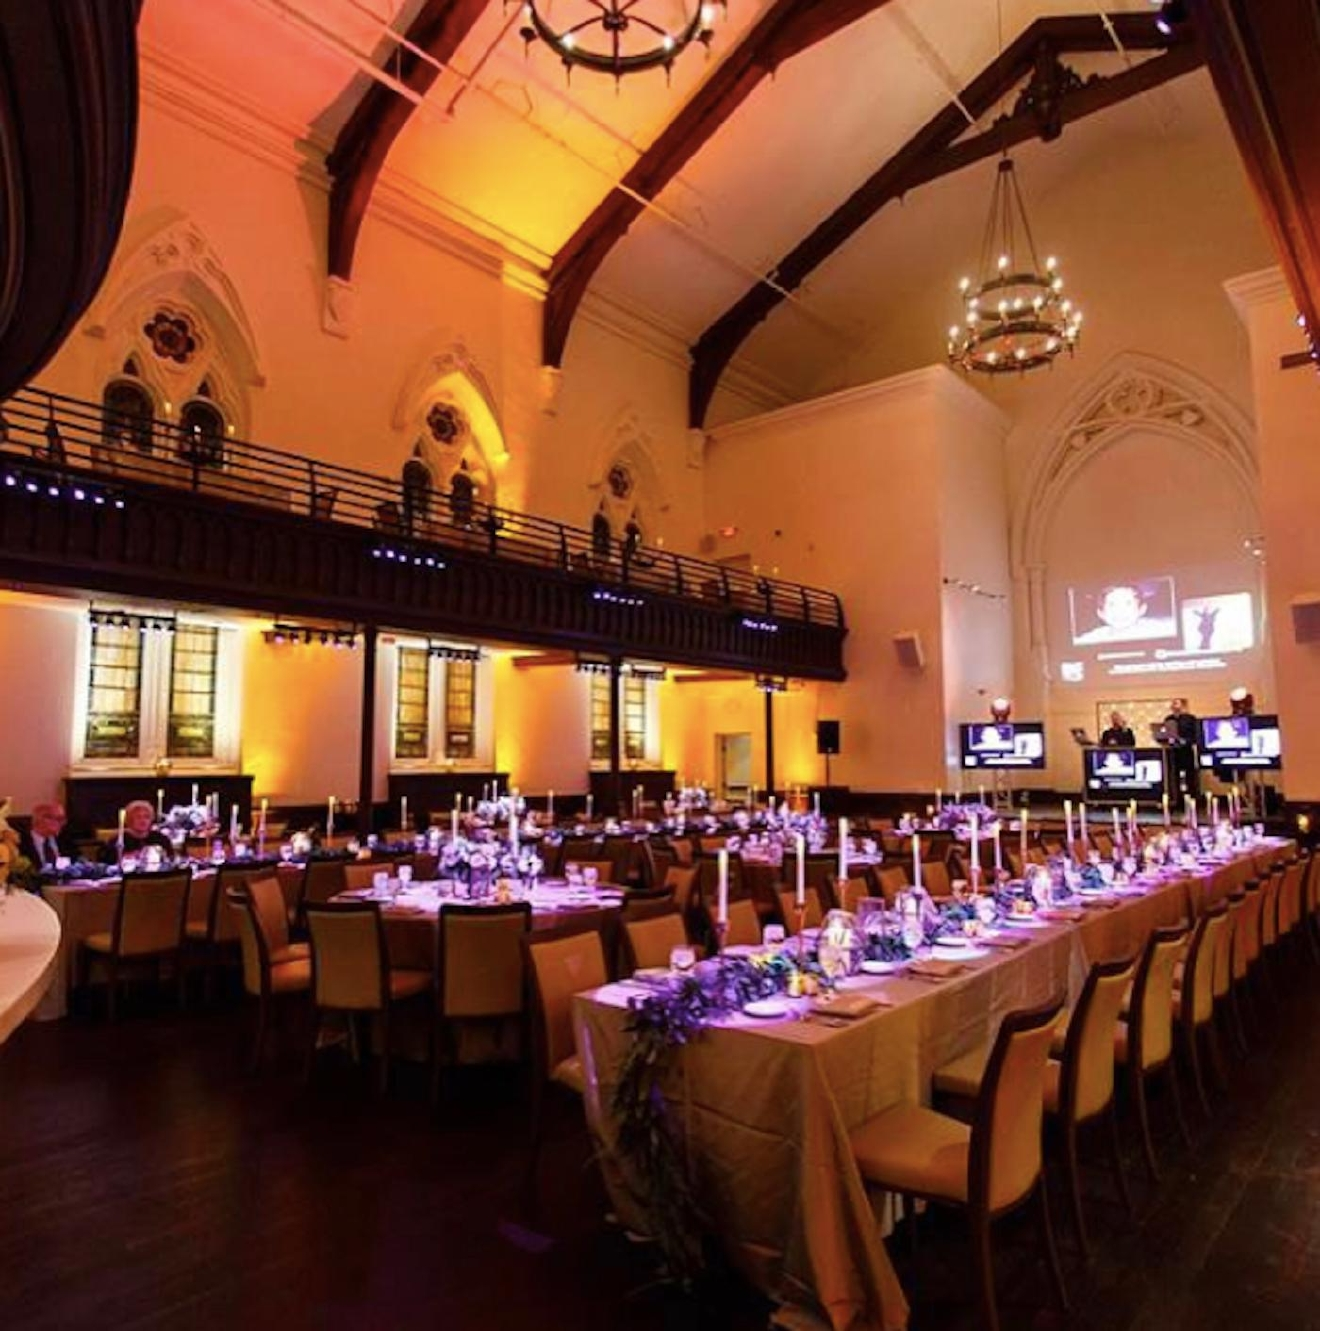 Top Wedding Venues In Cincinnati: 26 Amazing Venues For The Perfect Event In Cincy